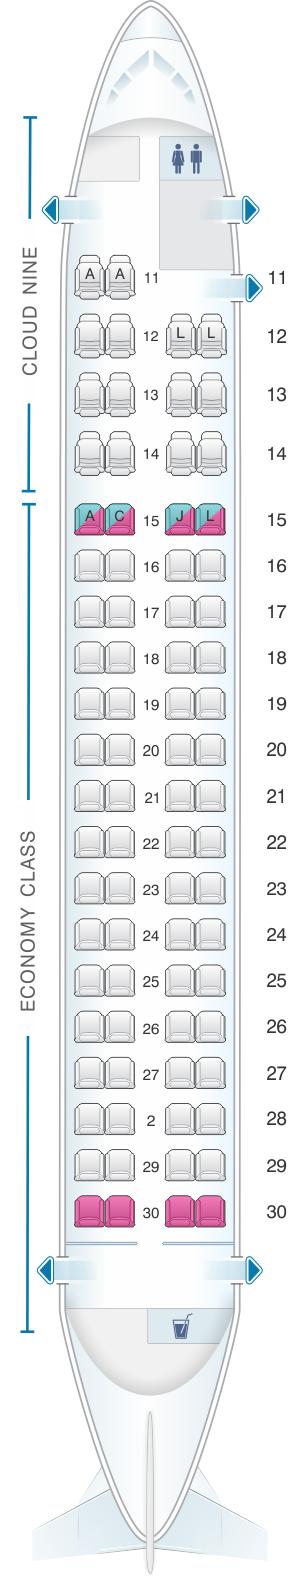 Seat map for Ethiopian Q400 cloude nine